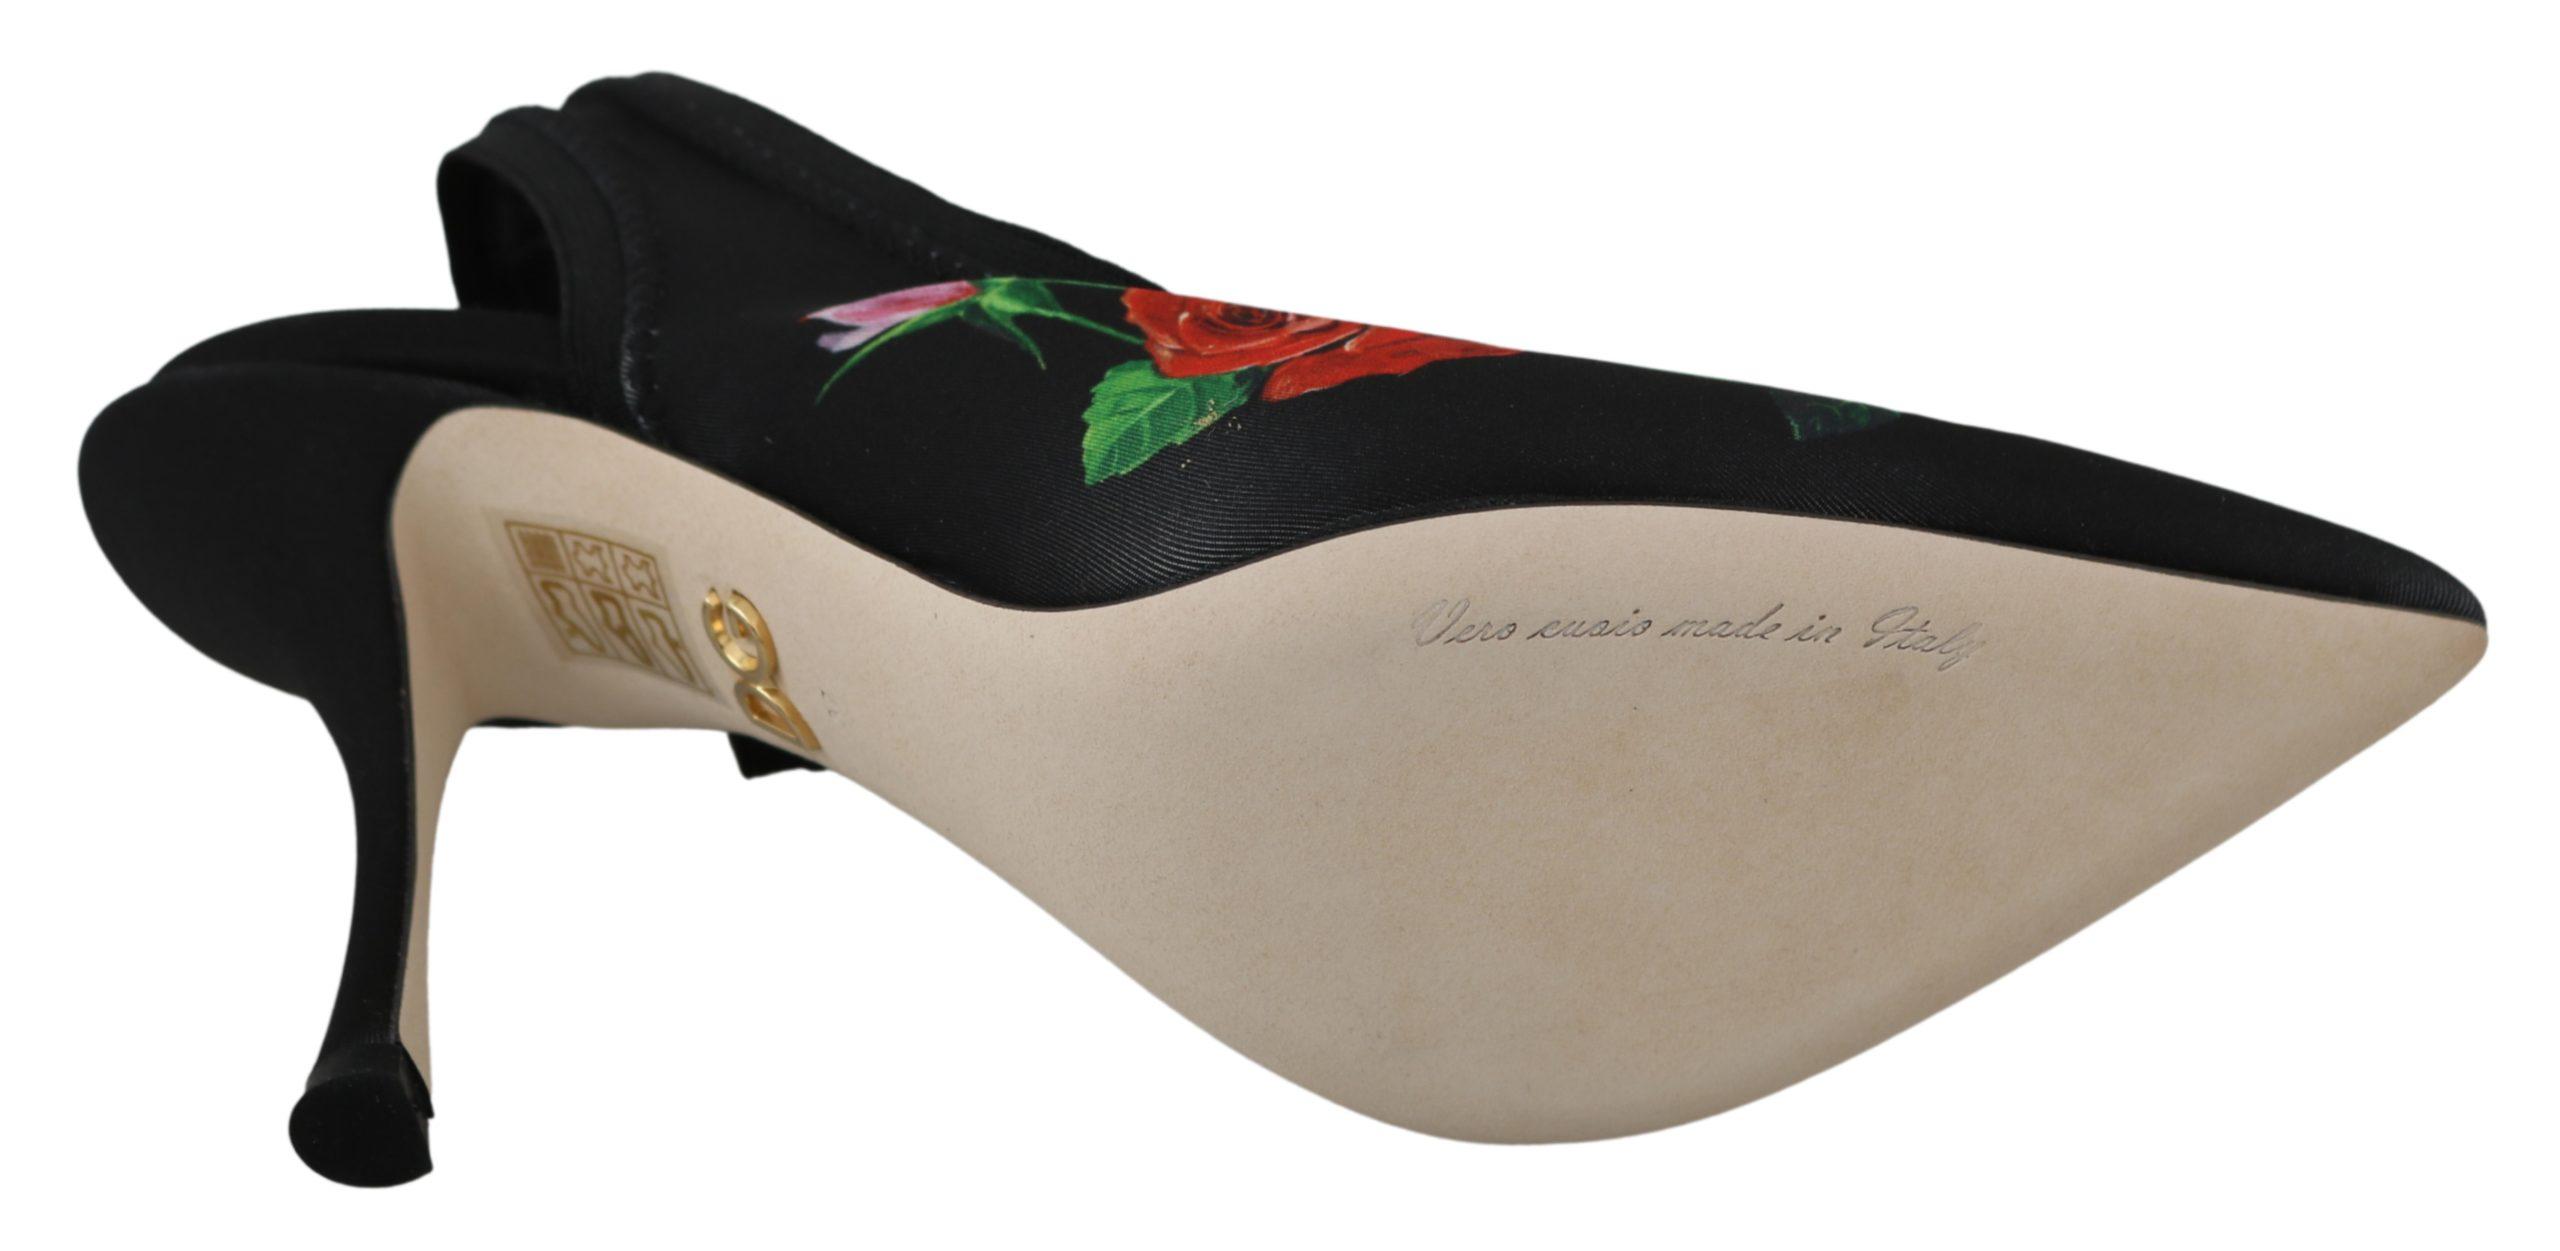 Dolce & Gabbana Women's Roses Stretch Slingback Pumps Black LA6585 - EU35.5/US5